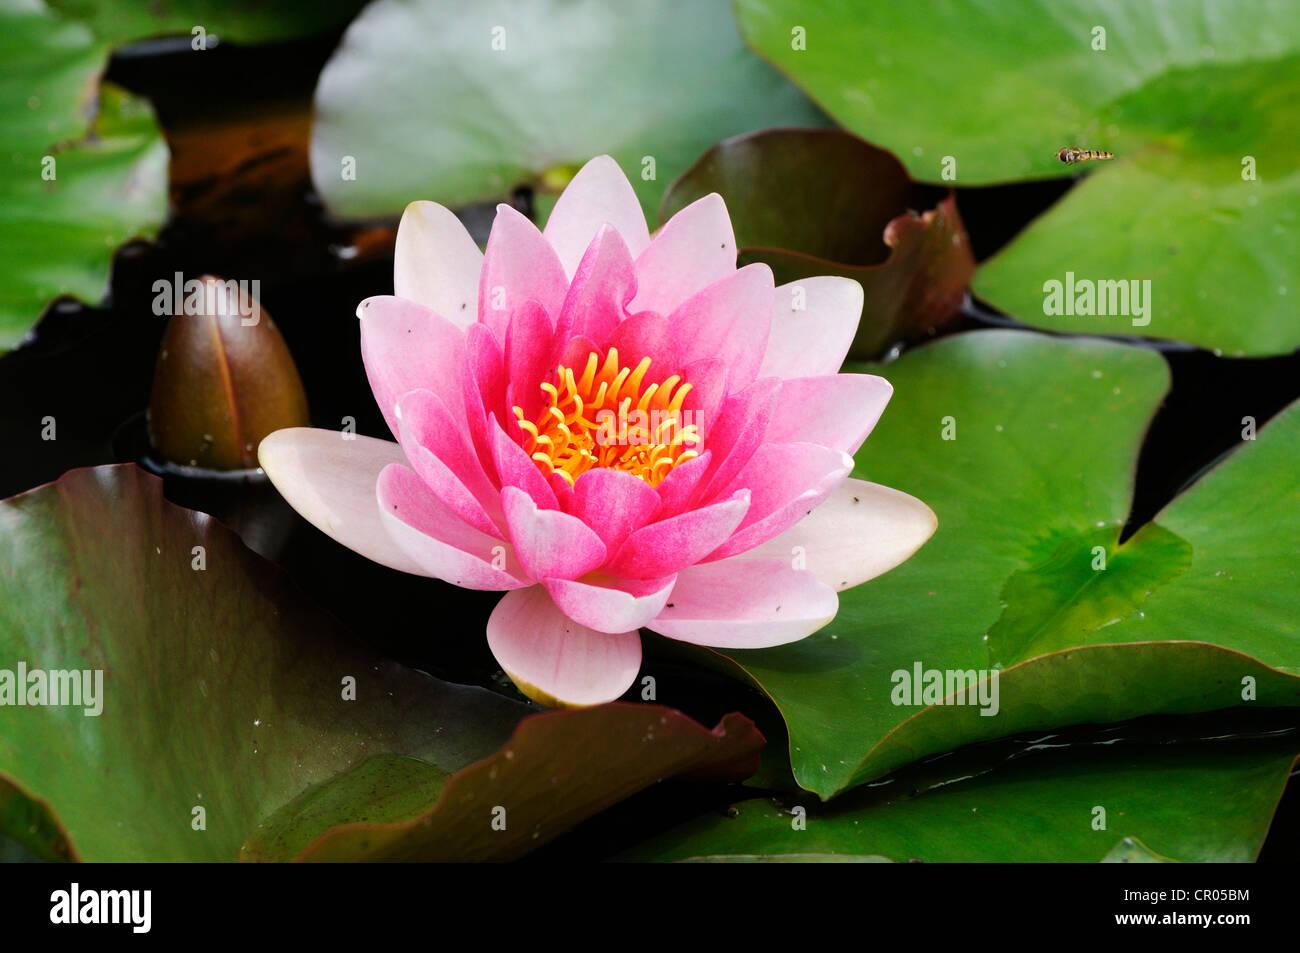 Water Lily (Nymphaea), Seleger Moor, Rifferswil, Zurich, Switzerland, Europe - Stock Image